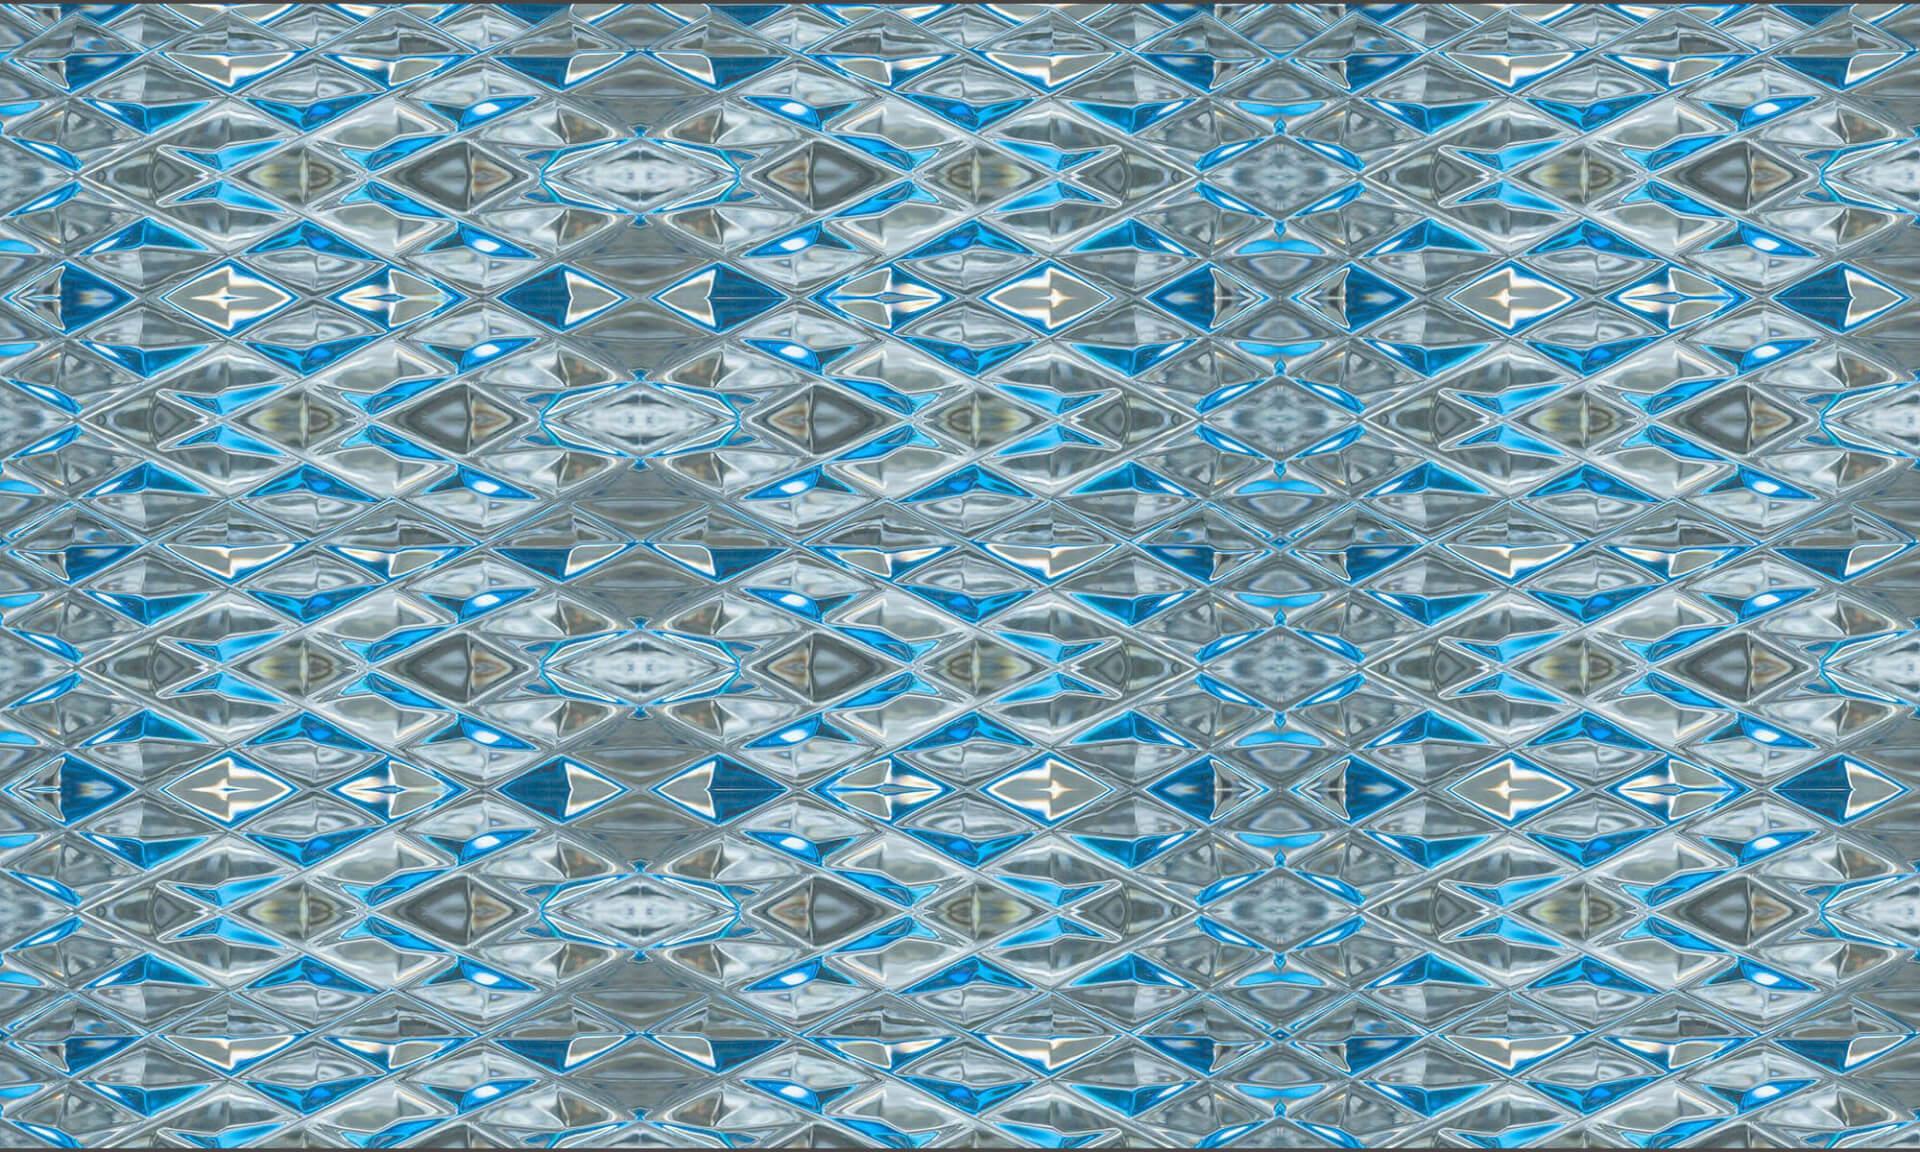 Diamond Blue Glass (DE9054) Doug Garrabrants